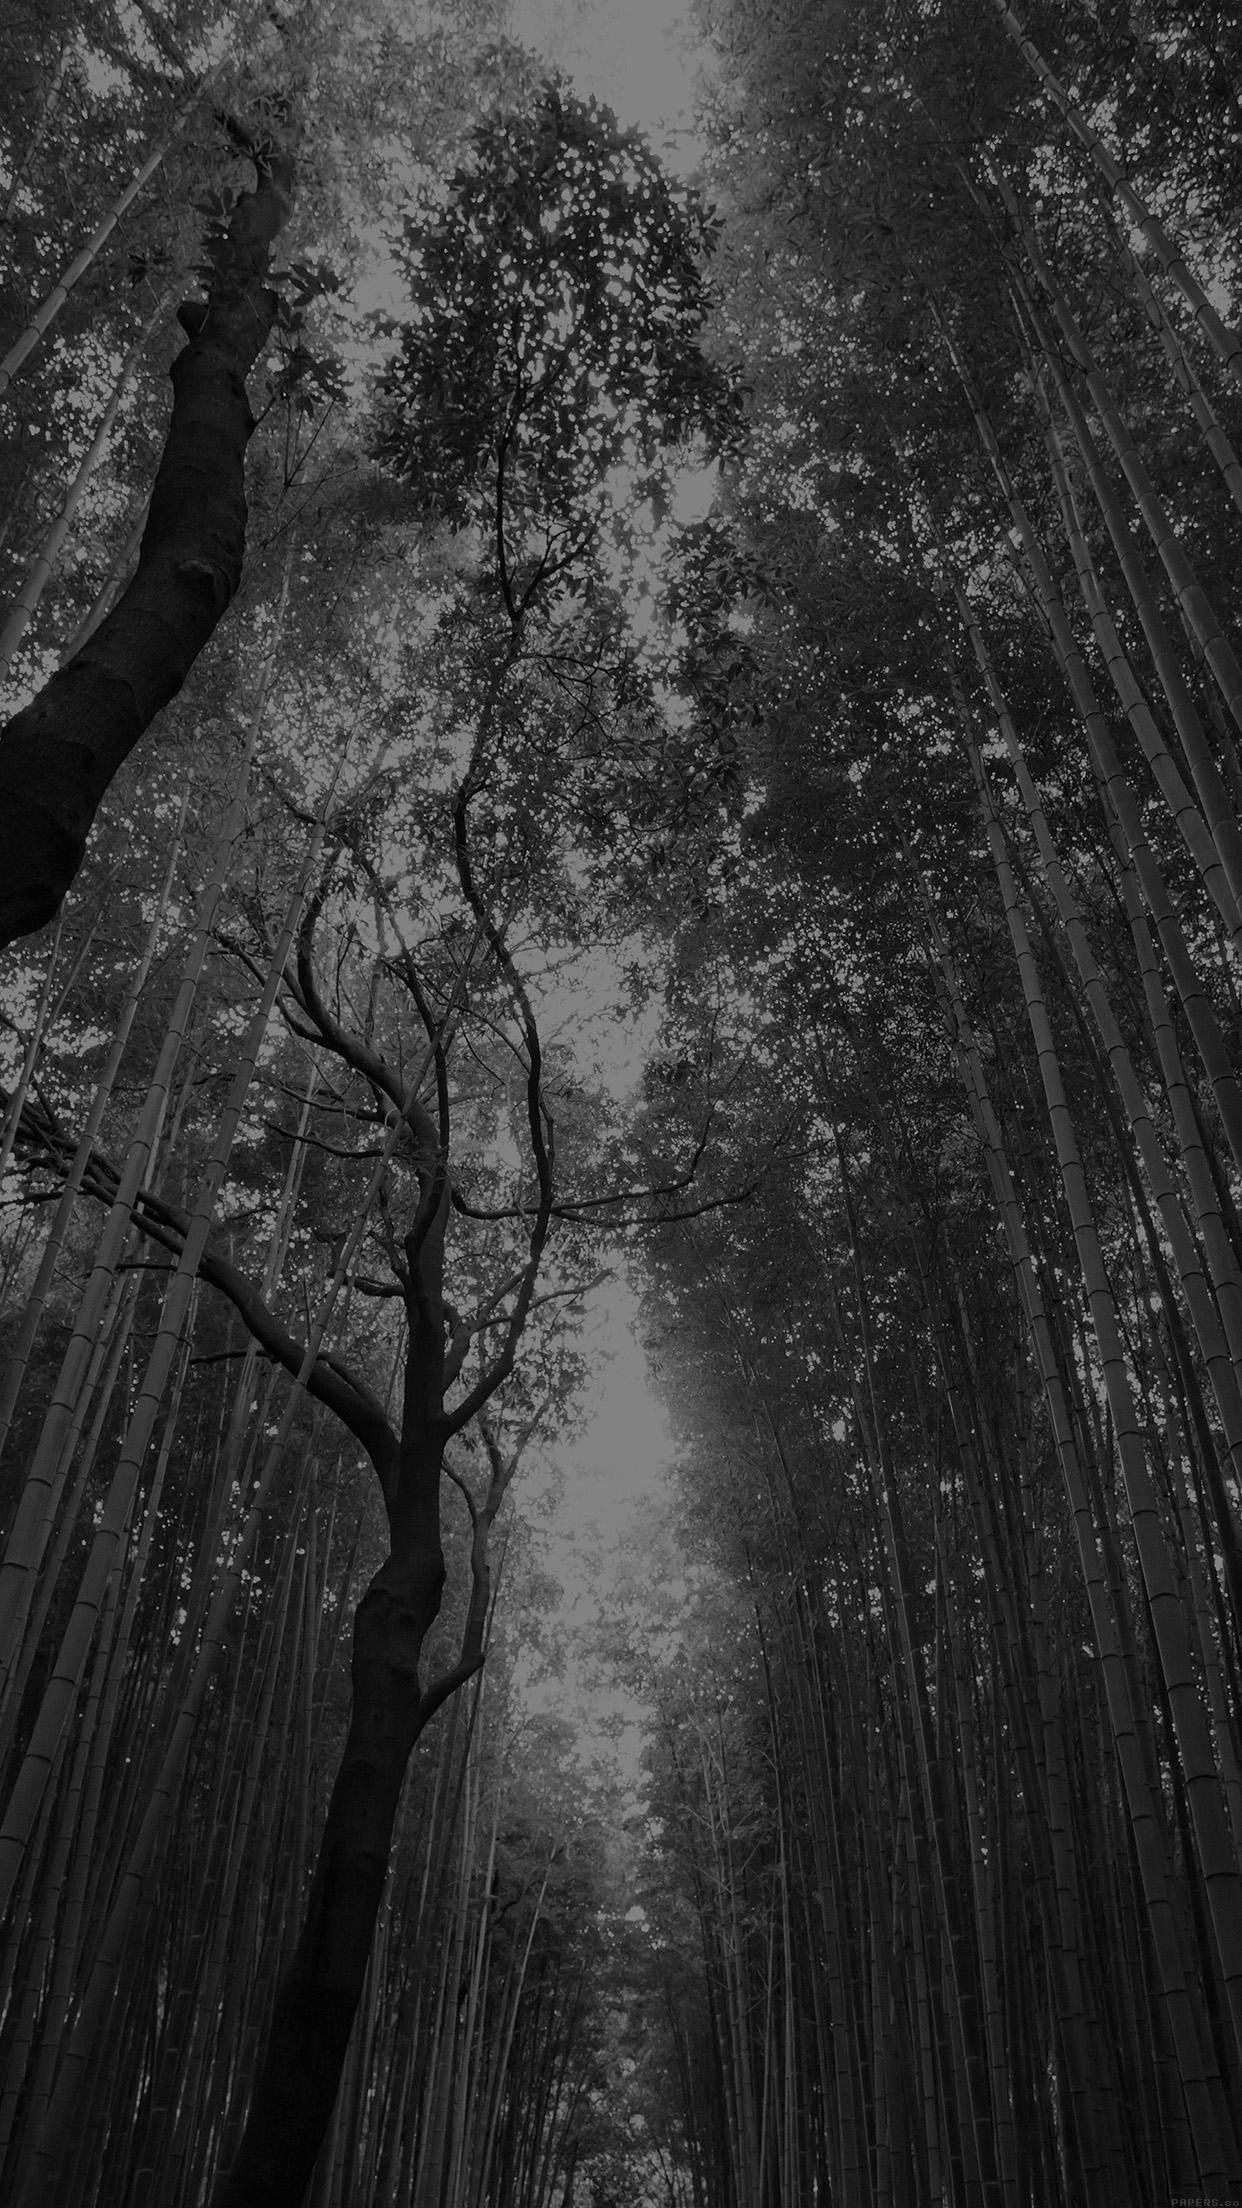 Iphone x - Nature wallpaper dark ...